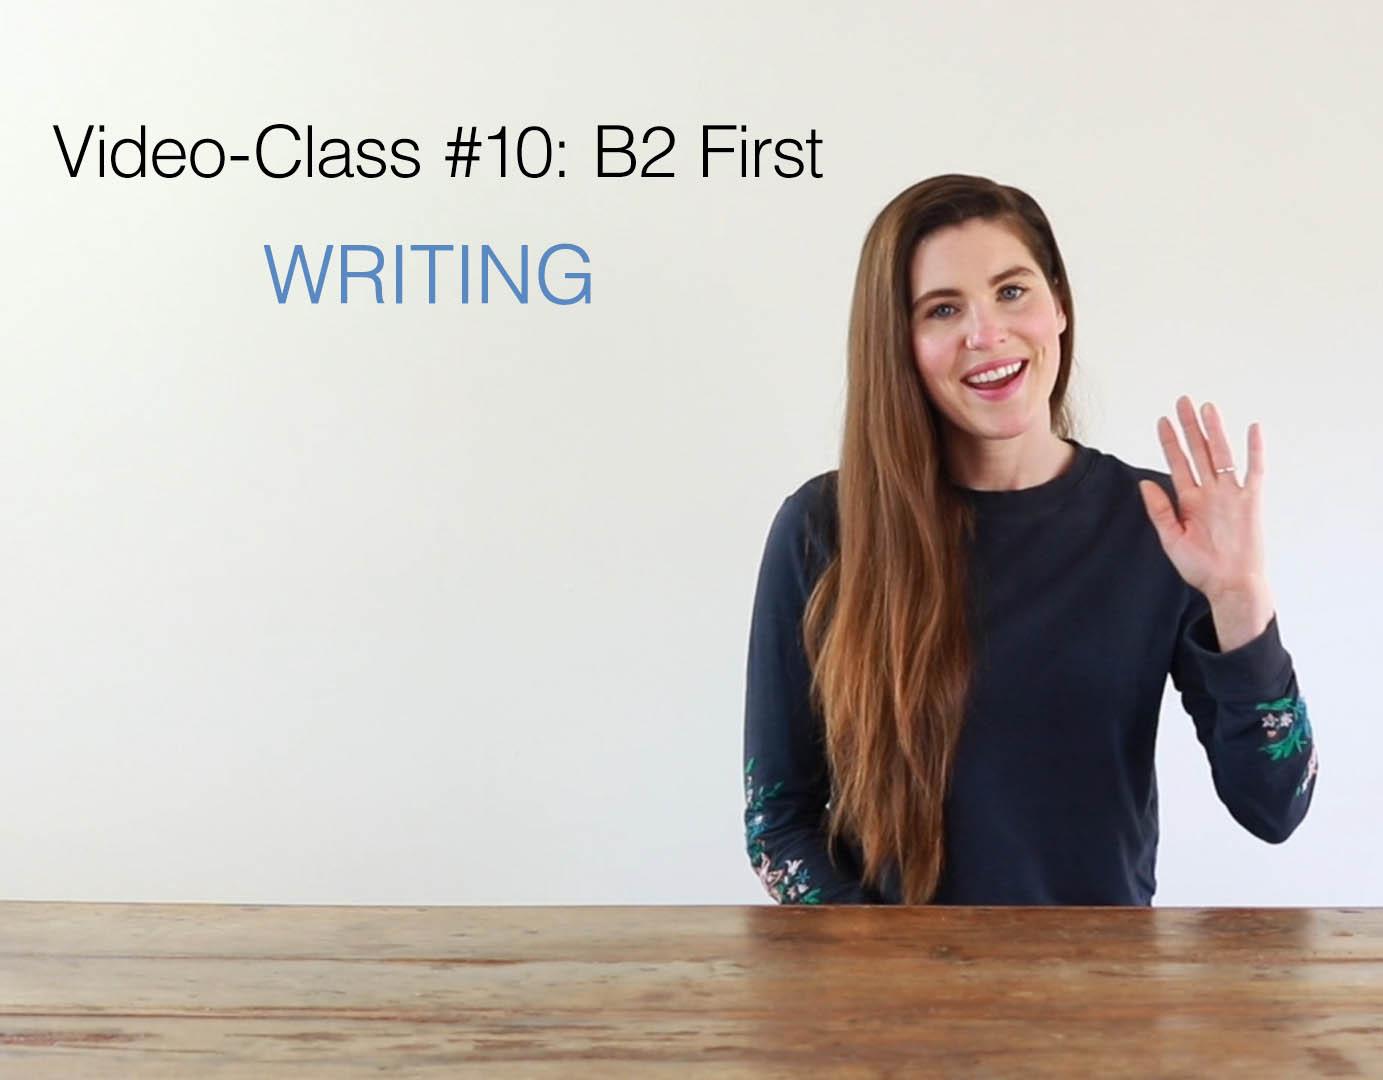 B2 First video class (10) Ac ingles